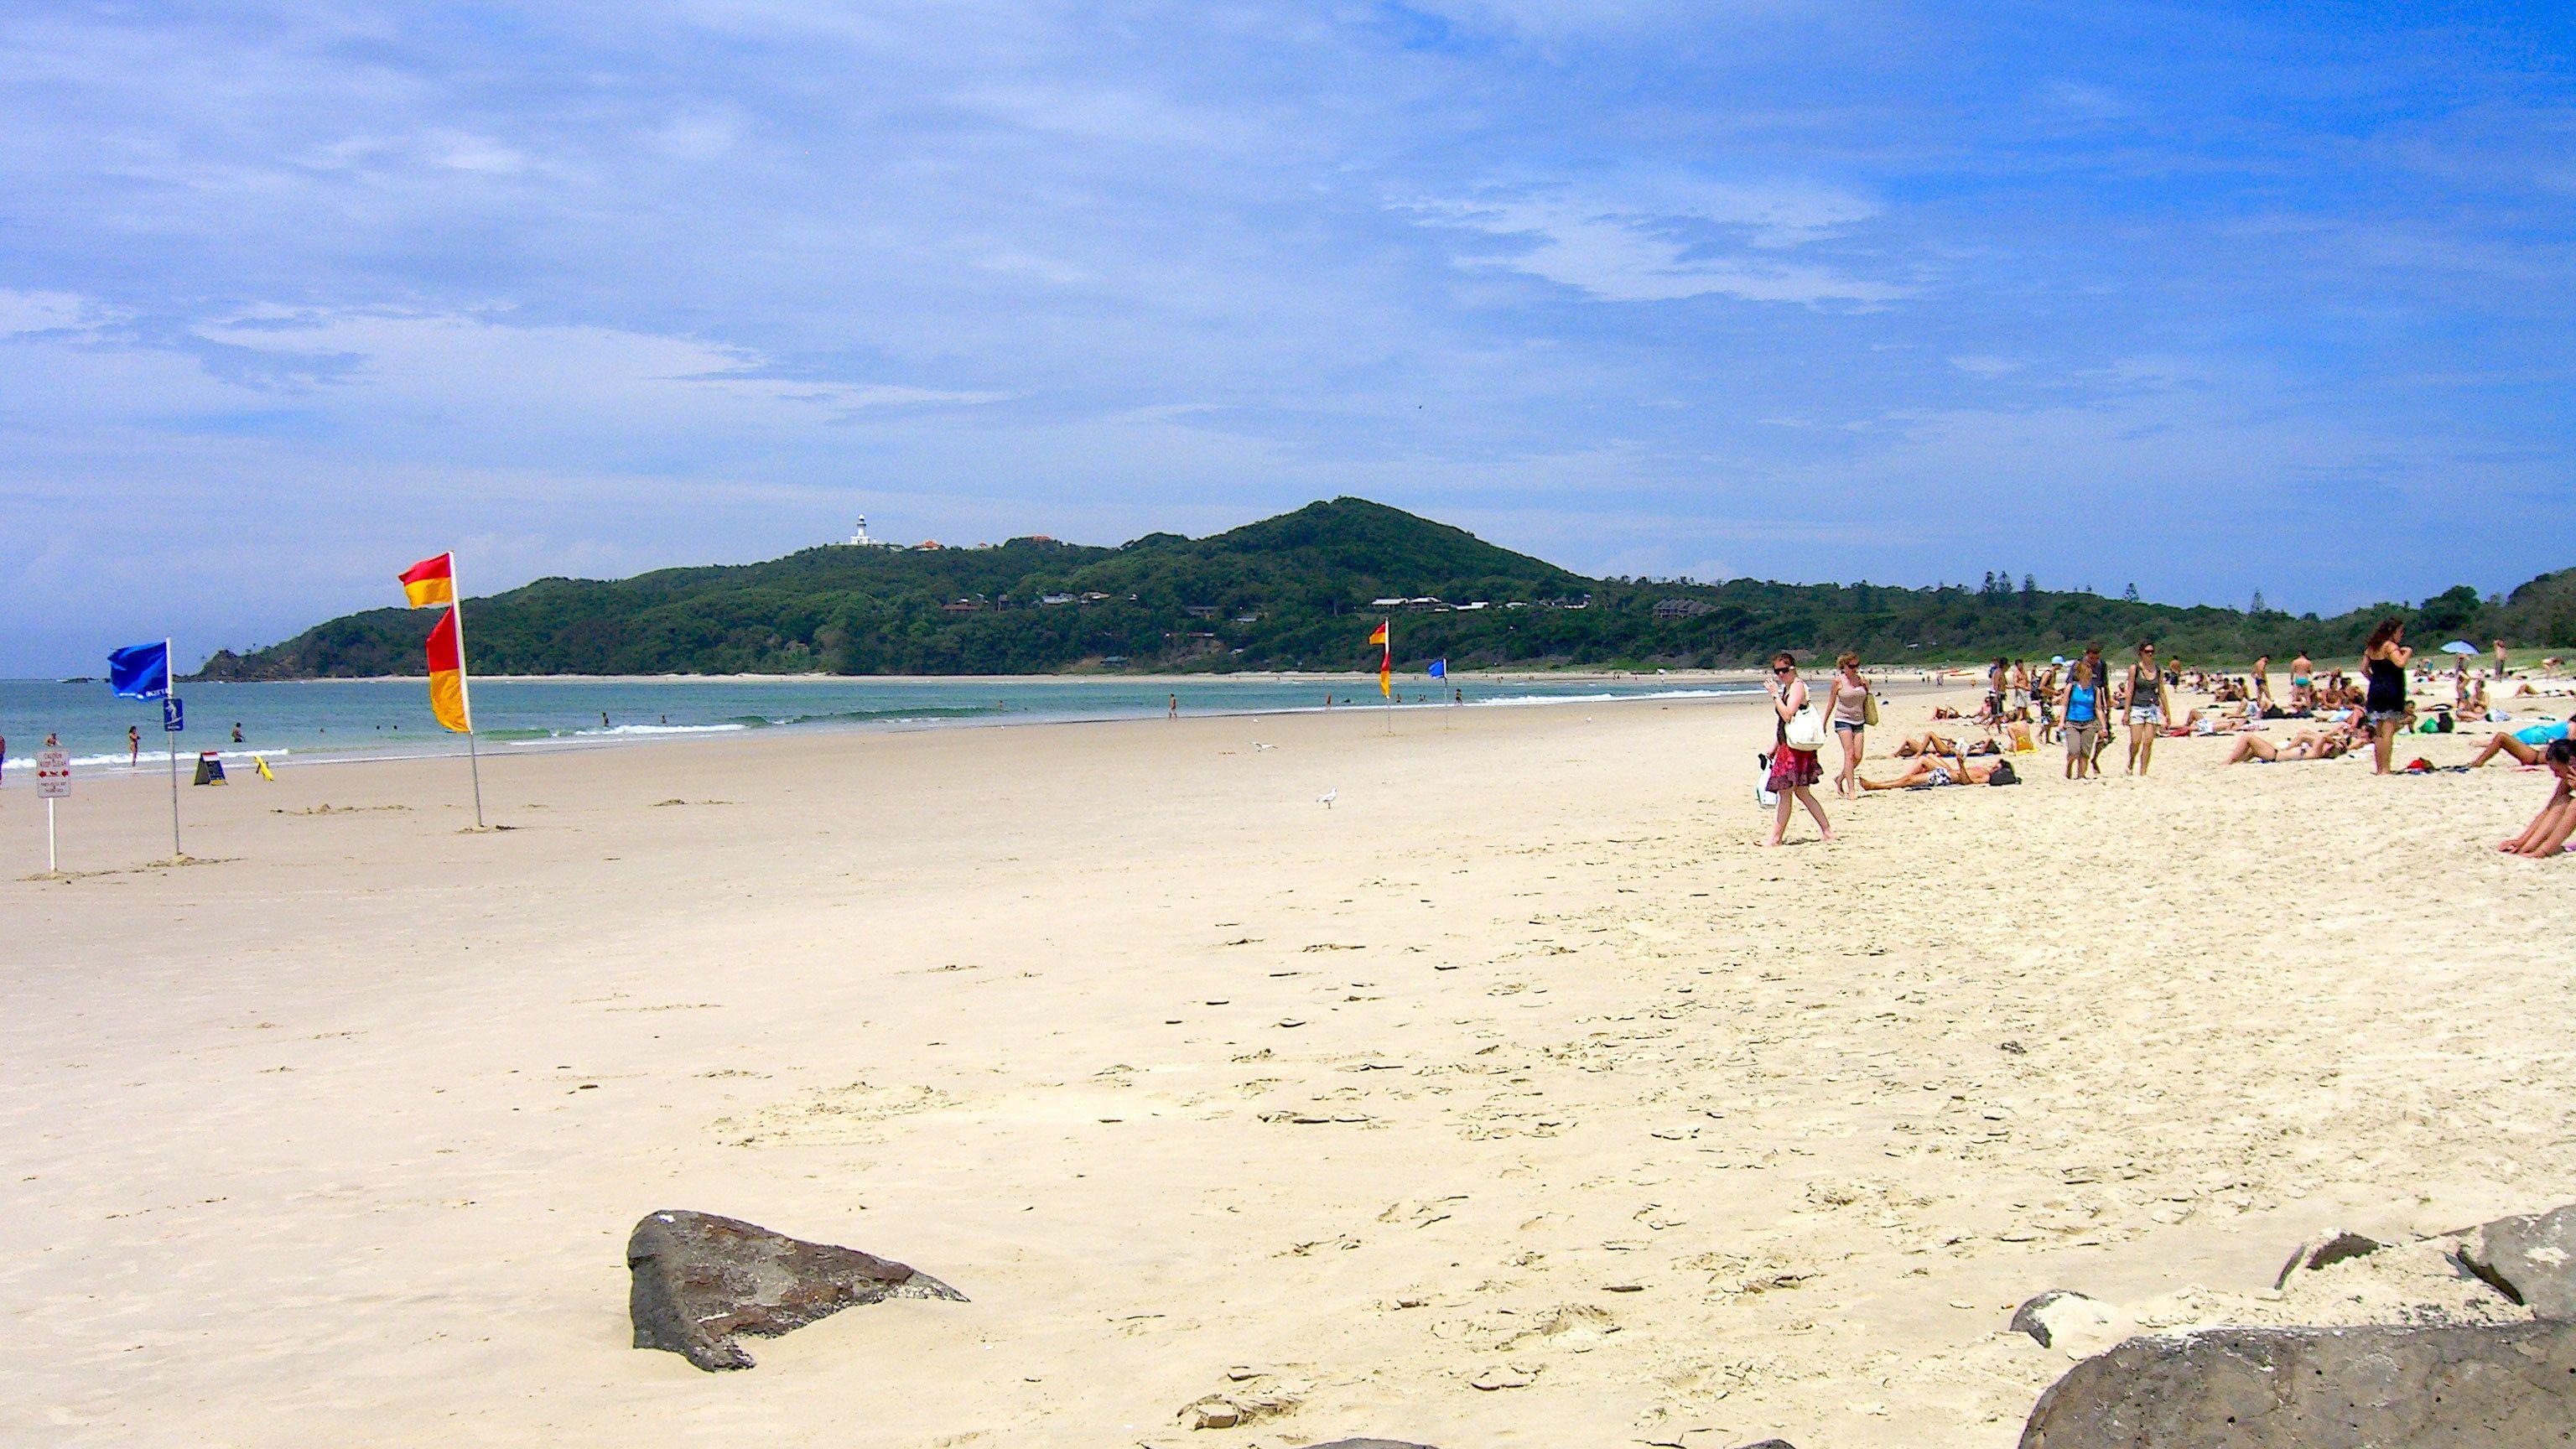 beachgoers enjoy the sun at Byron Bay in Australia